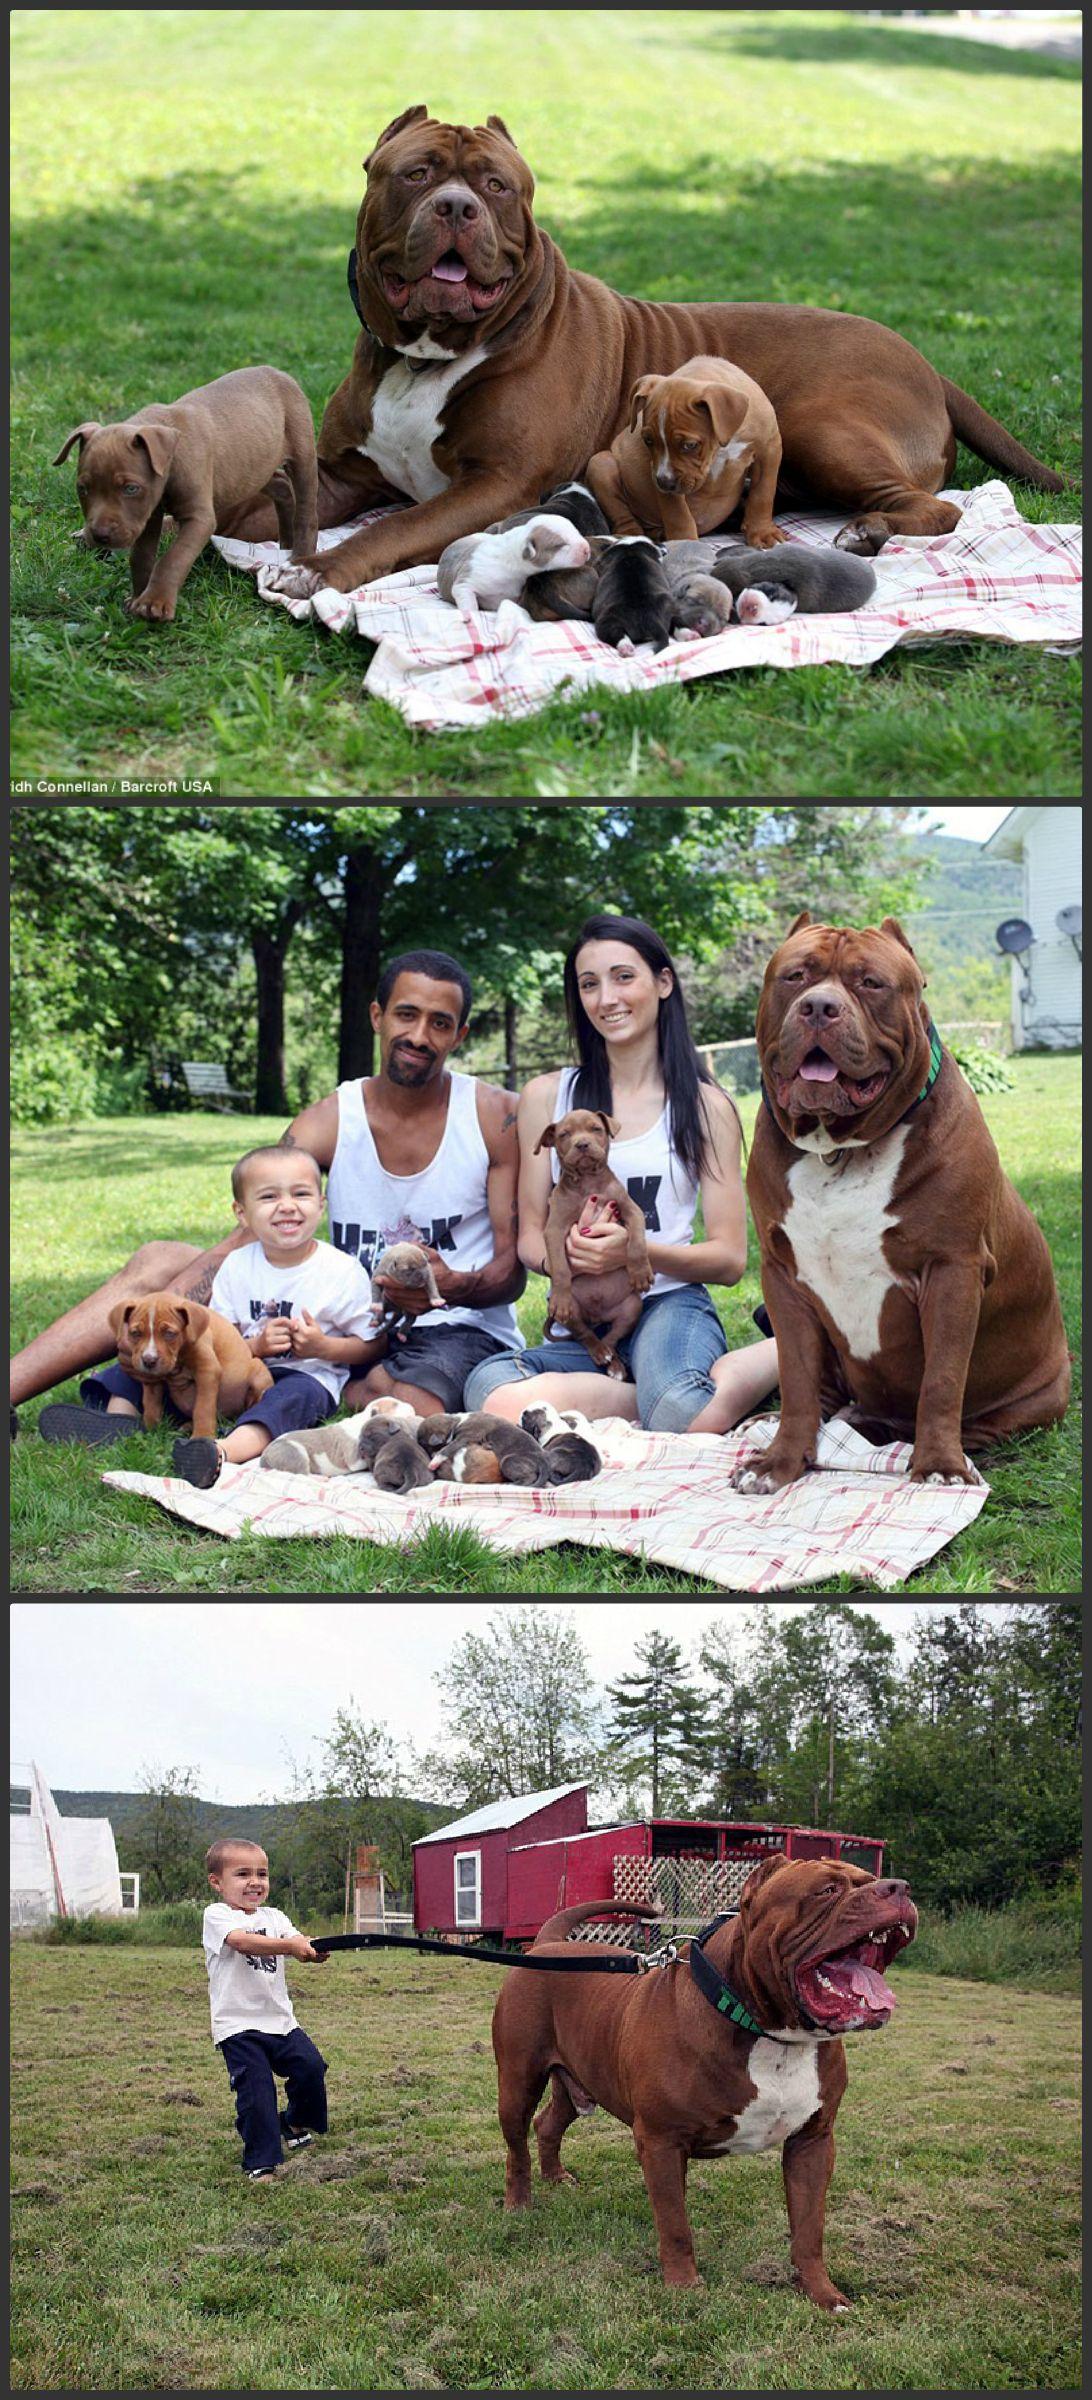 Xxl pitbull puppies for sale in ohio